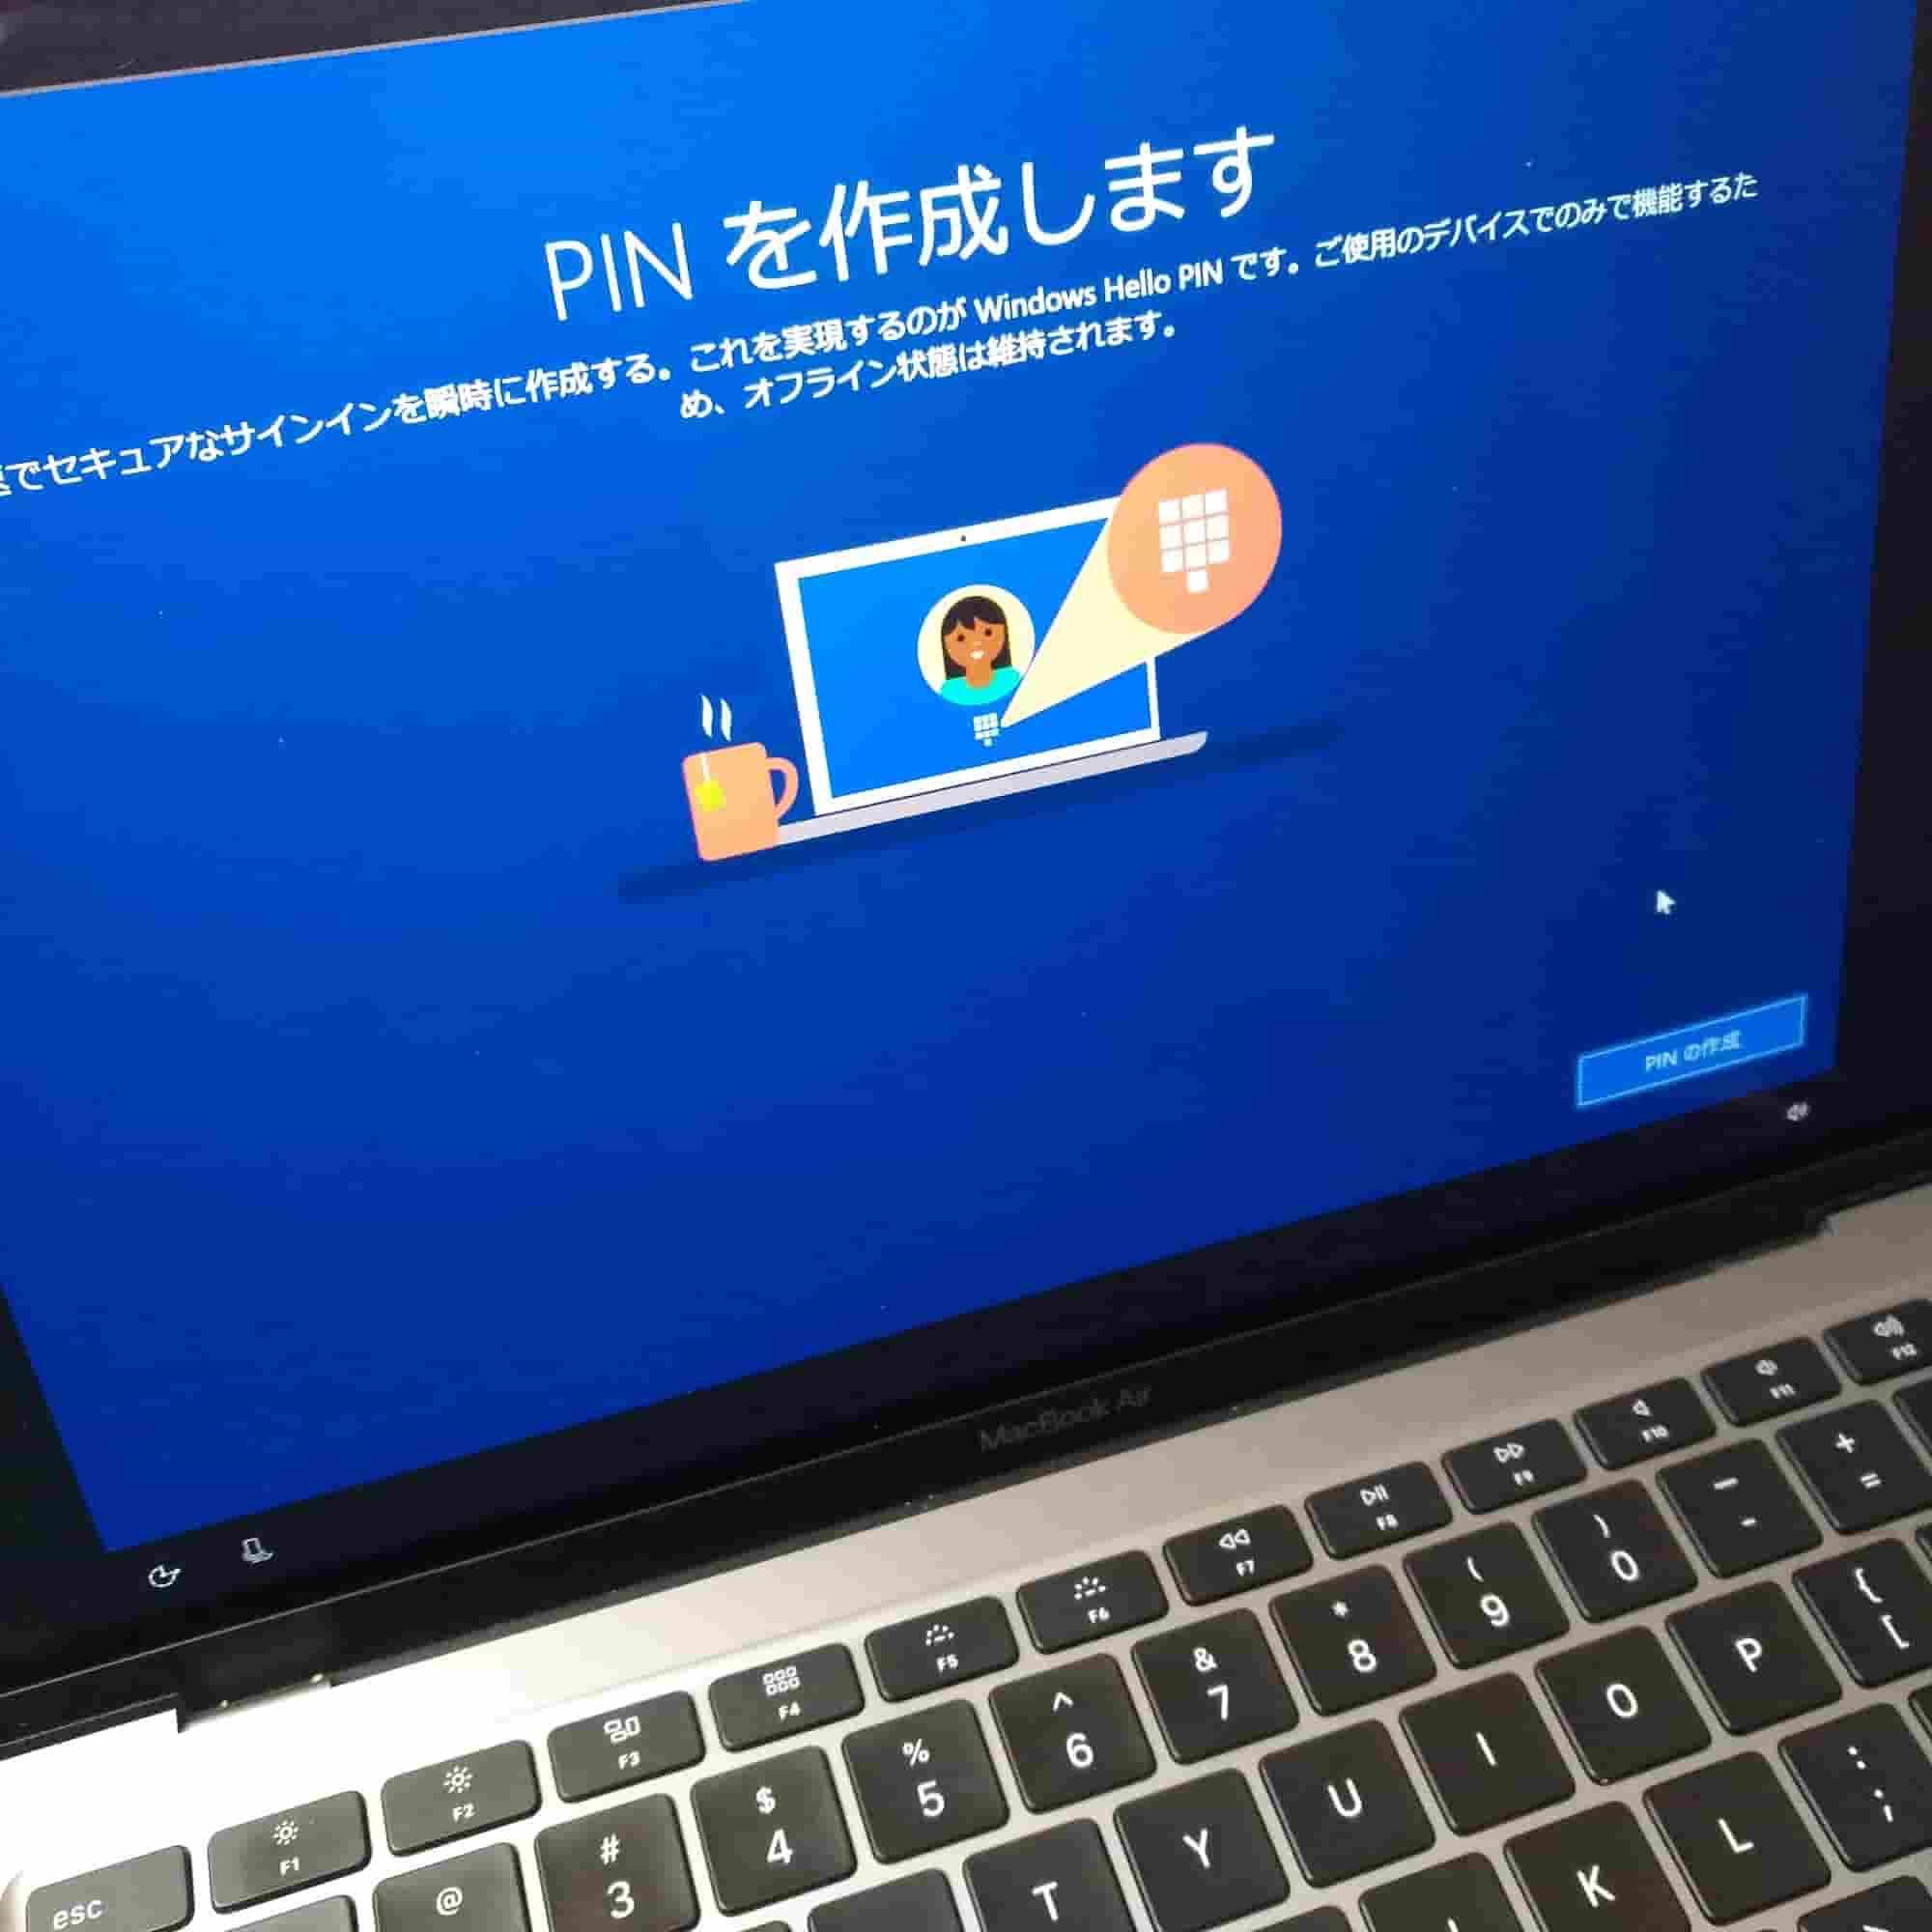 windows10 install pin